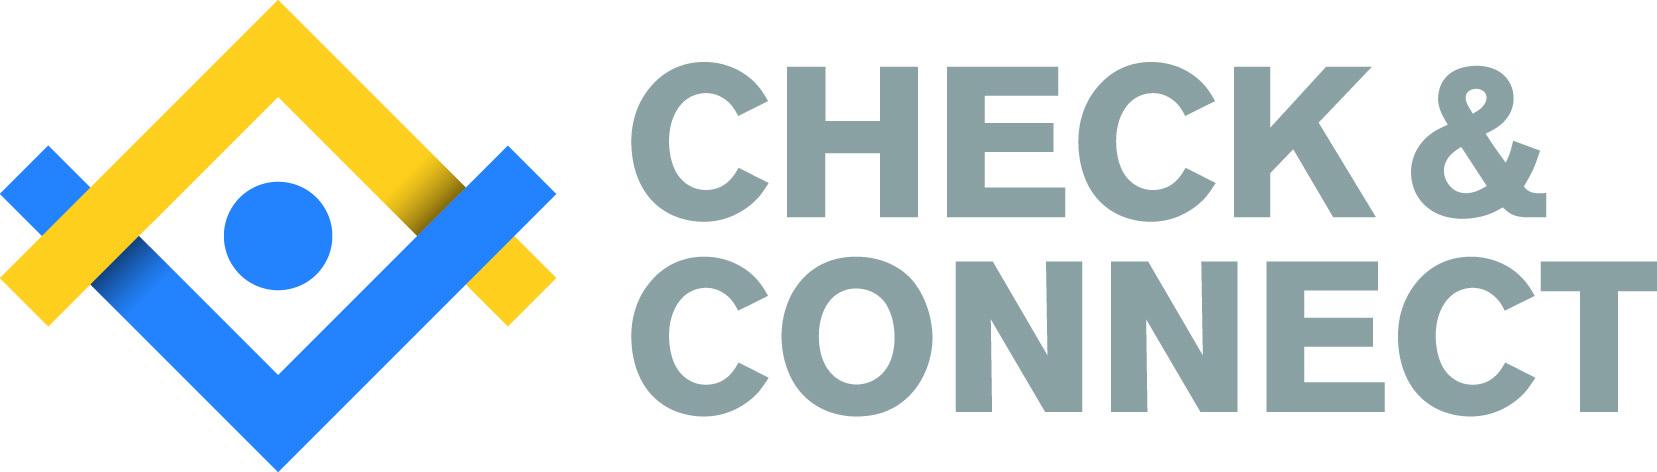 checkconnect_logo_h_cmyk.jpg